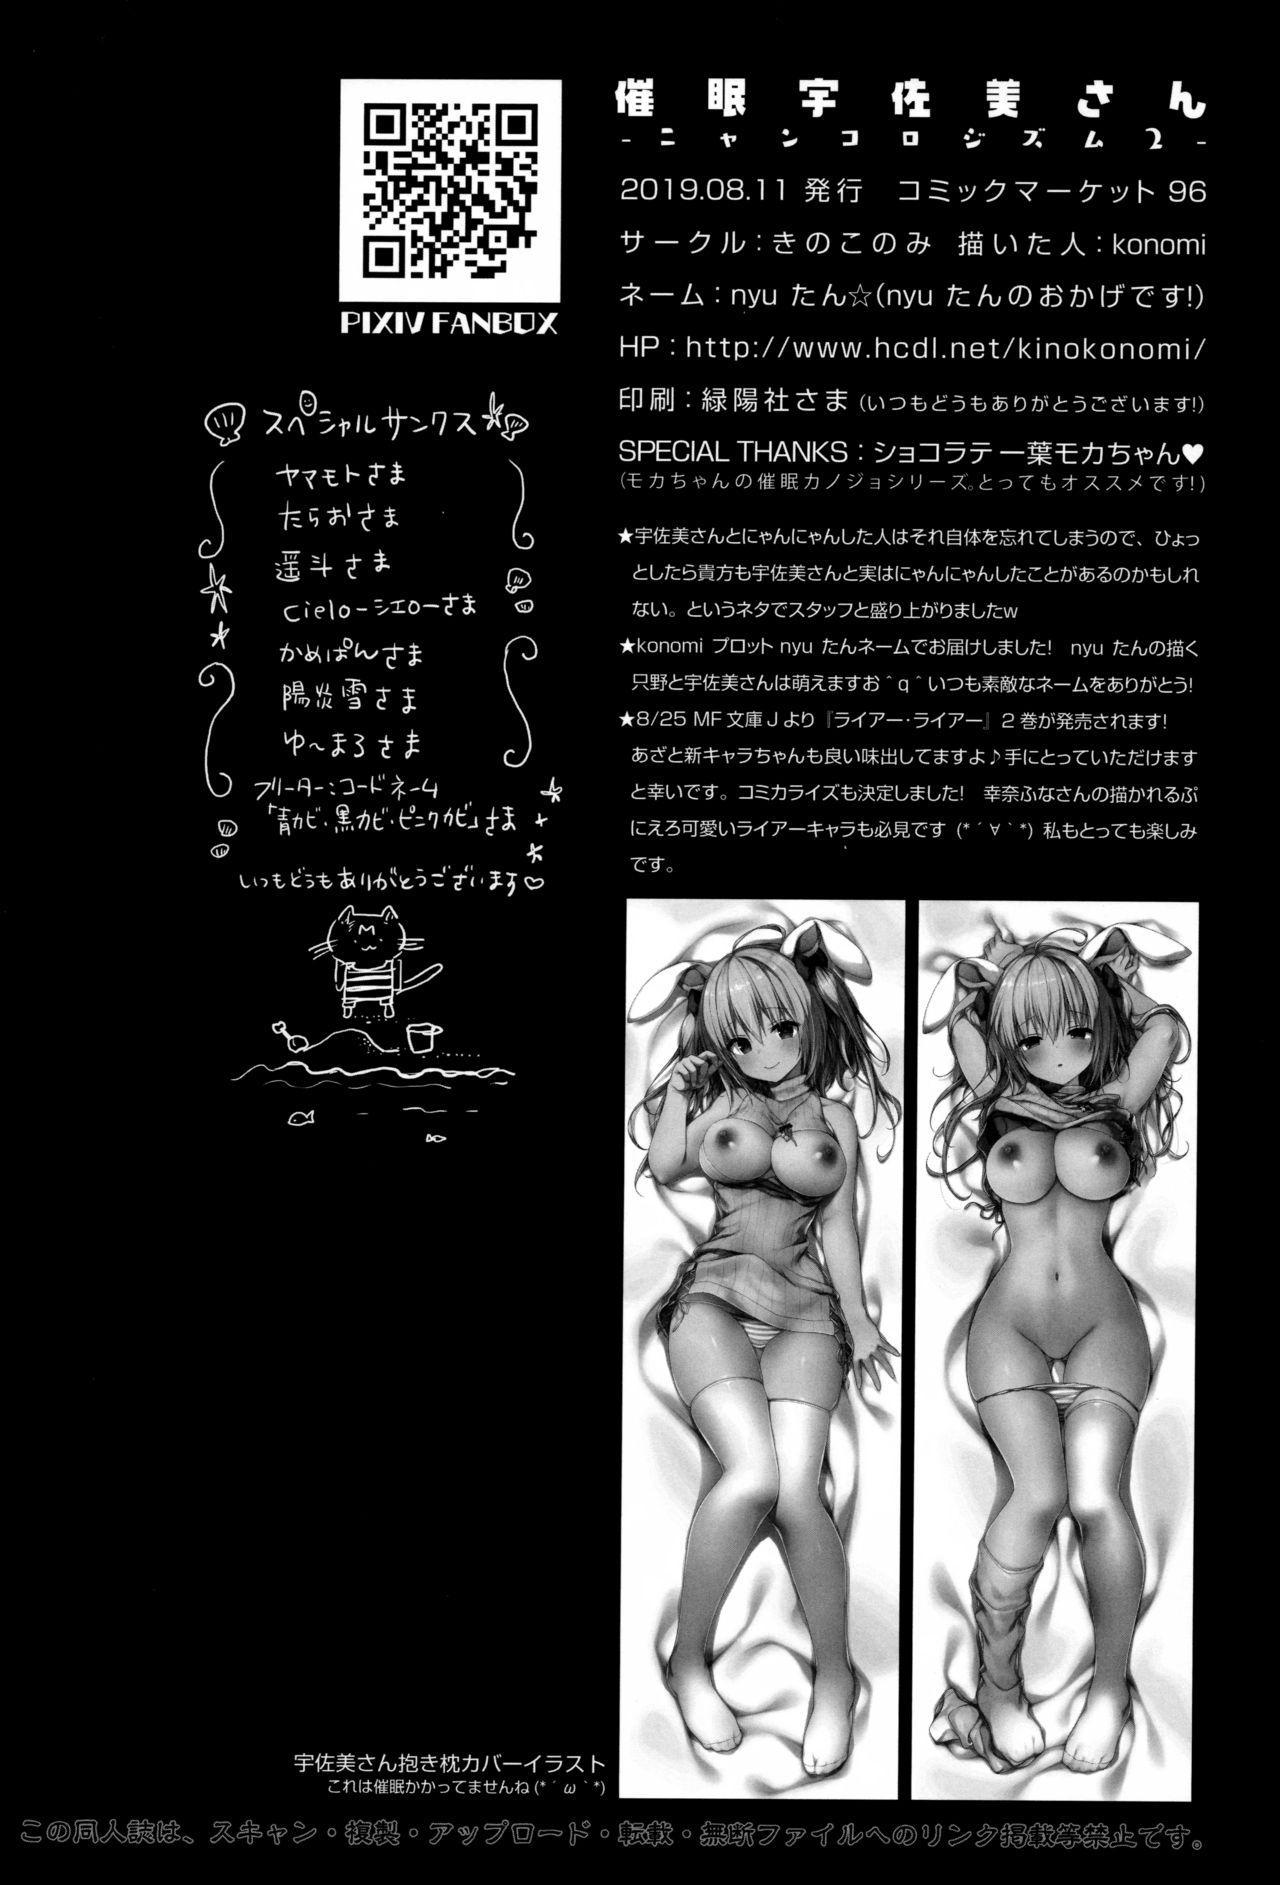 (C96) [Kinokonomi (konomi)] Saimin Usami-san -Nyancologism 2- 20